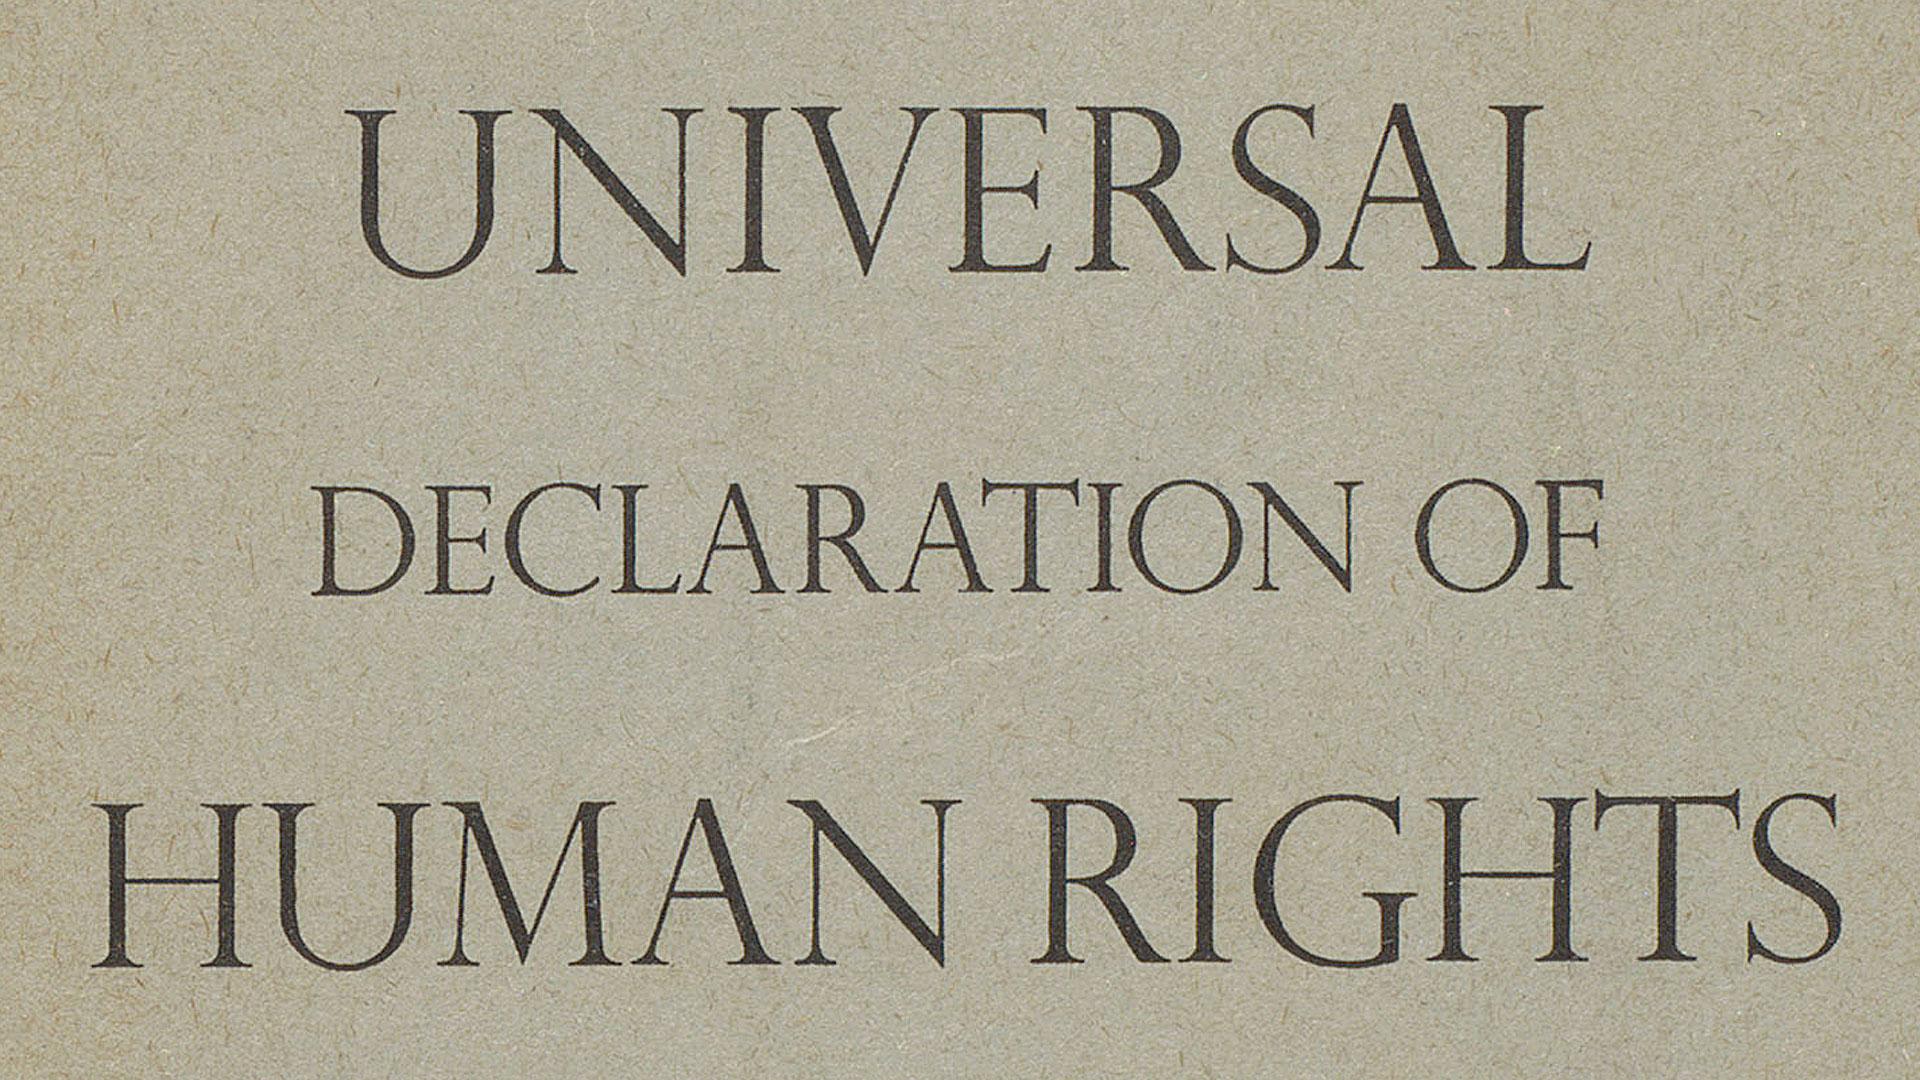 Human rights legislation